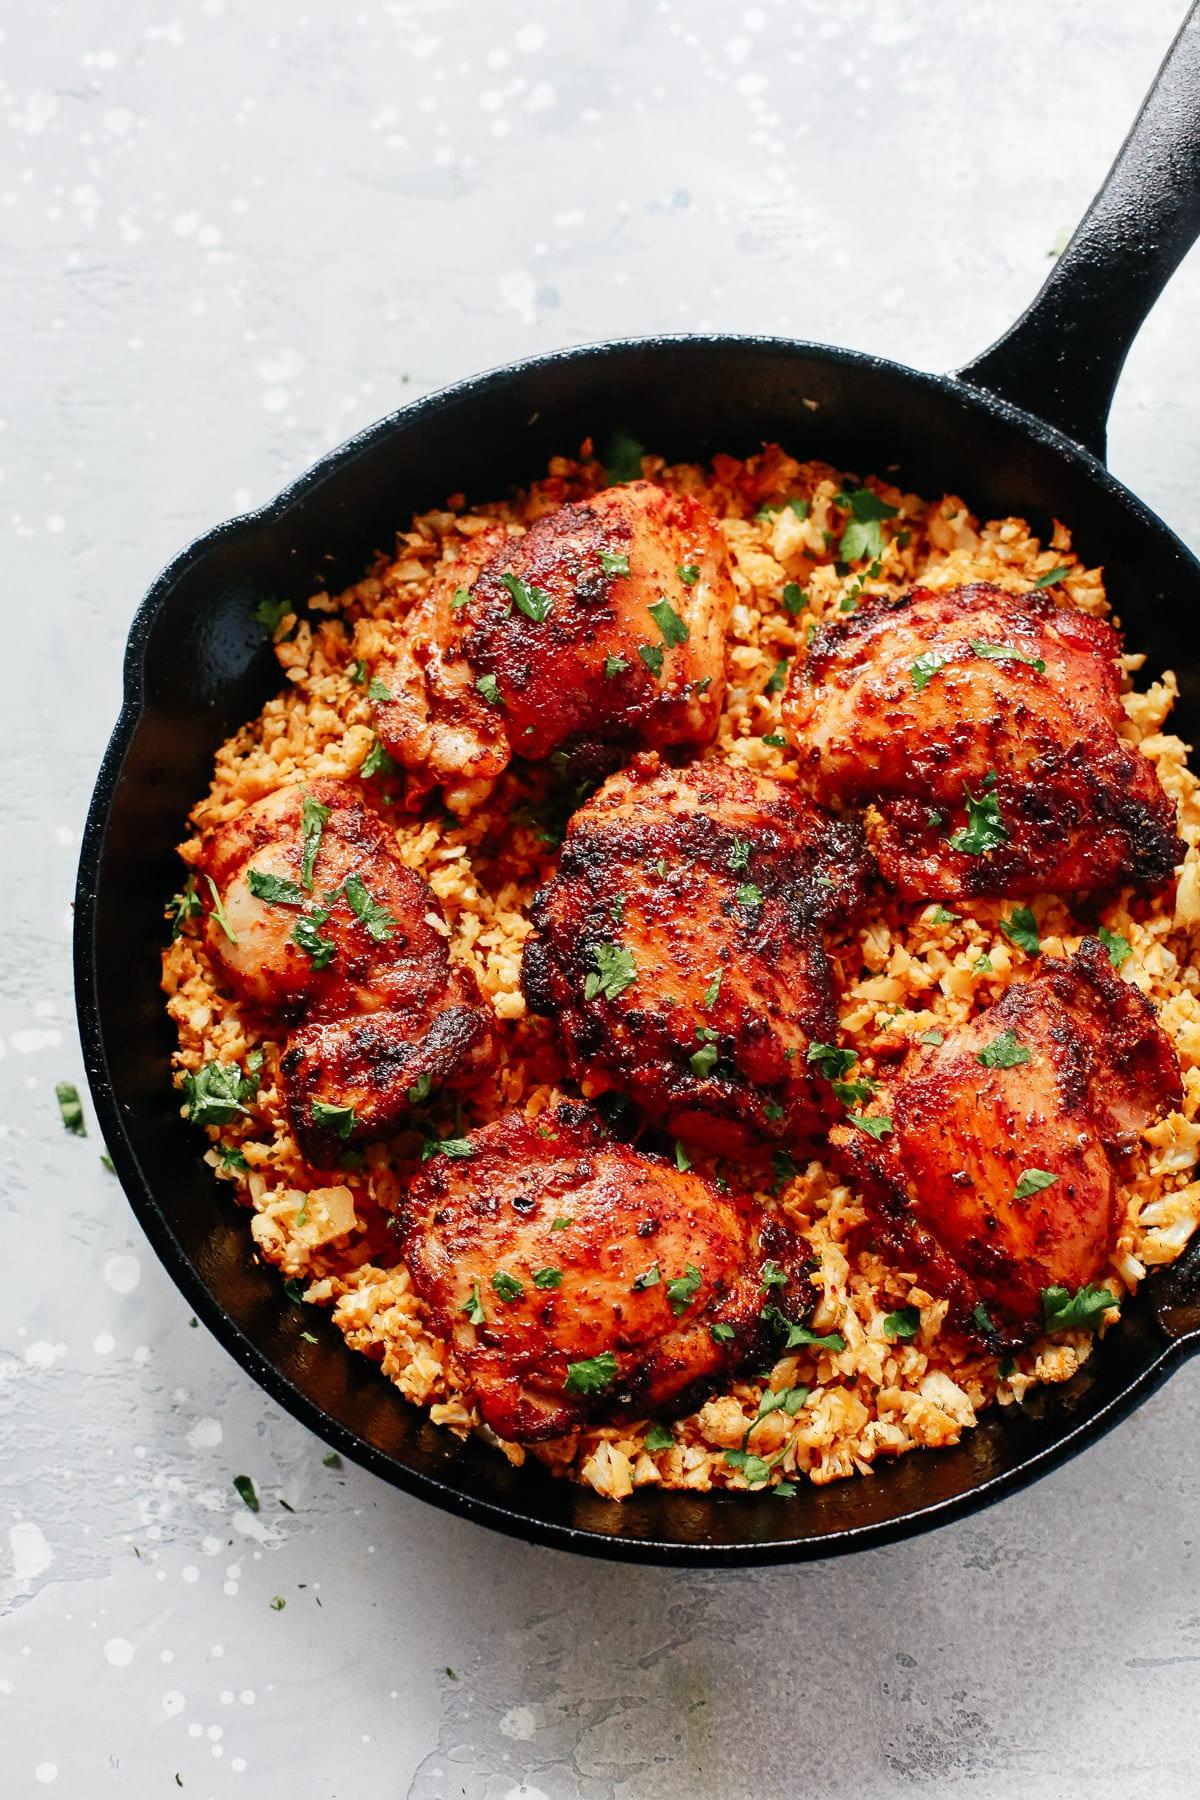 Black skillet with spicy chicken and cauliflower rice.